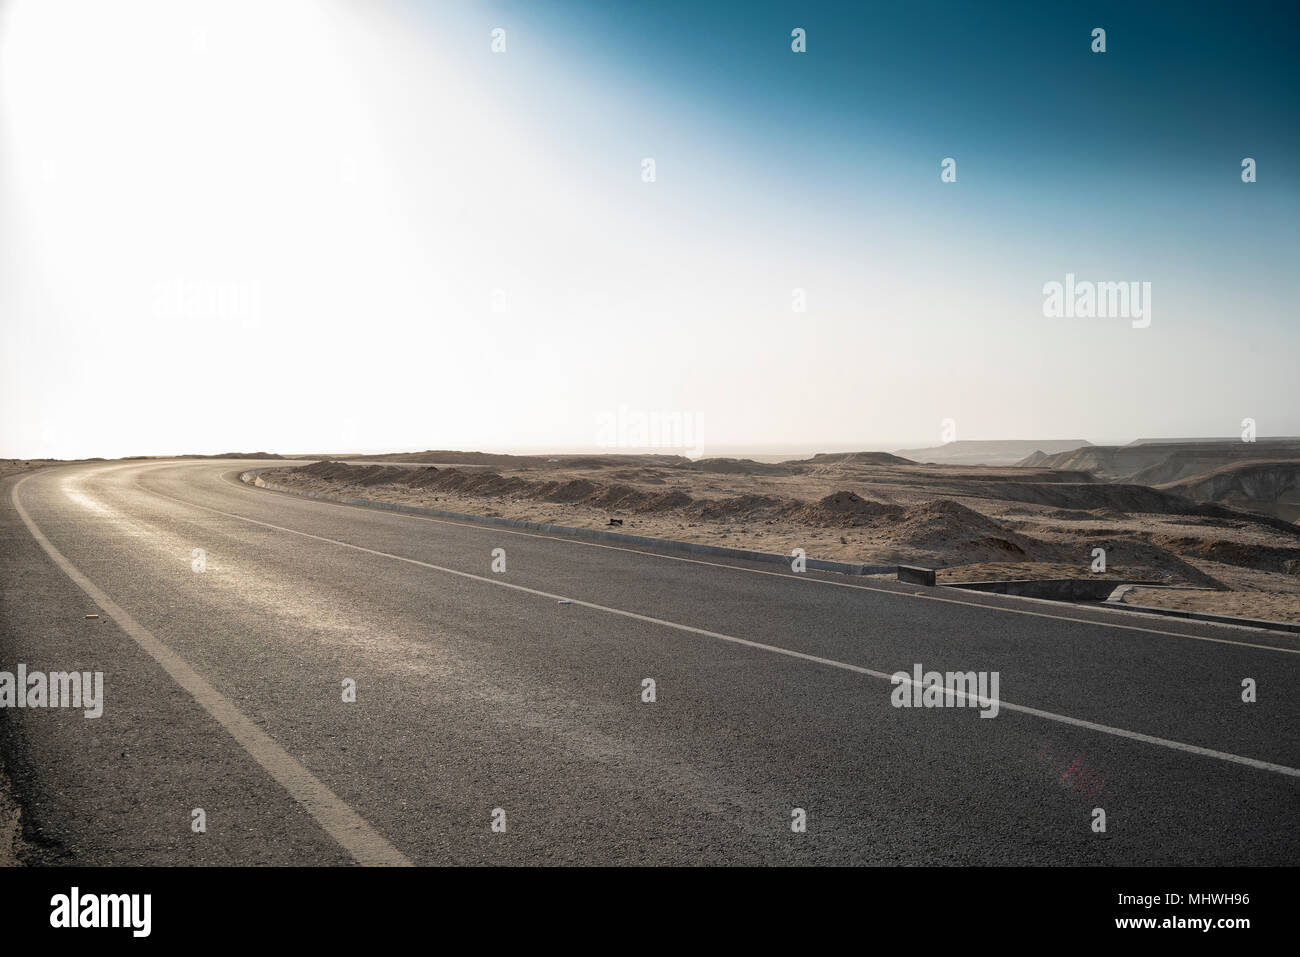 Asphalt road of the Namibe Desert. Africa. Angola. - Stock Image